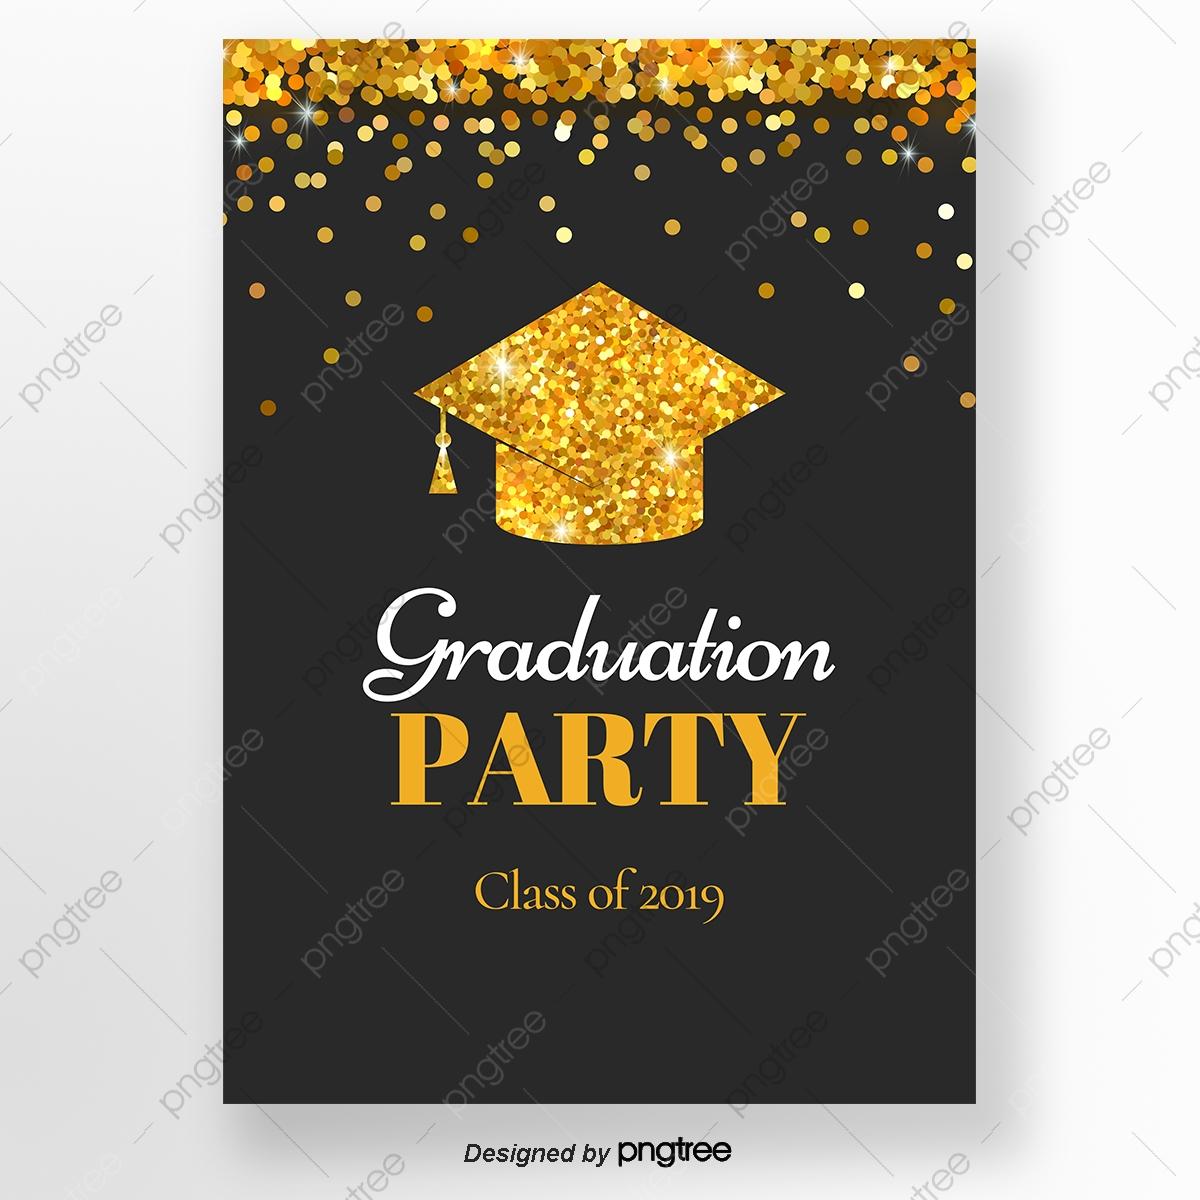 010 Unusual Graduation Party Invitation Template Photo  Microsoft Word 4 Per PageFull